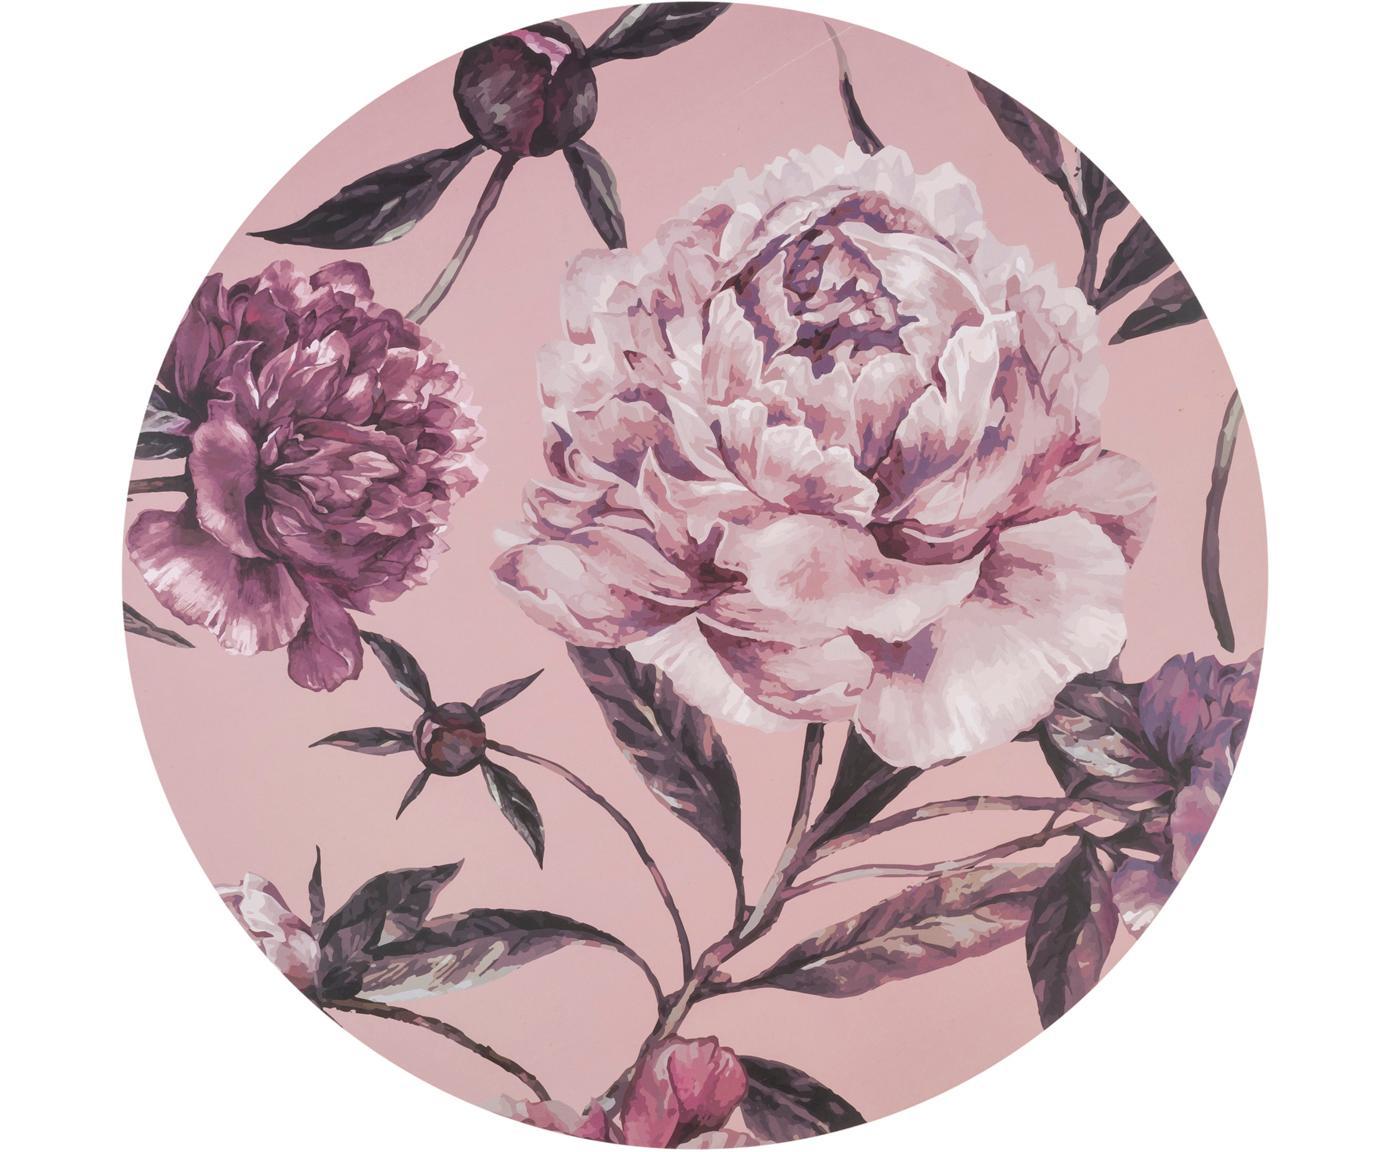 Manteles individuales redondos Secret Garden, 2uds., Parte superior: tablero de fibras de dens, Parte trasera: corcho, Tonos rosas, tonos verdes, Ø 38 cm